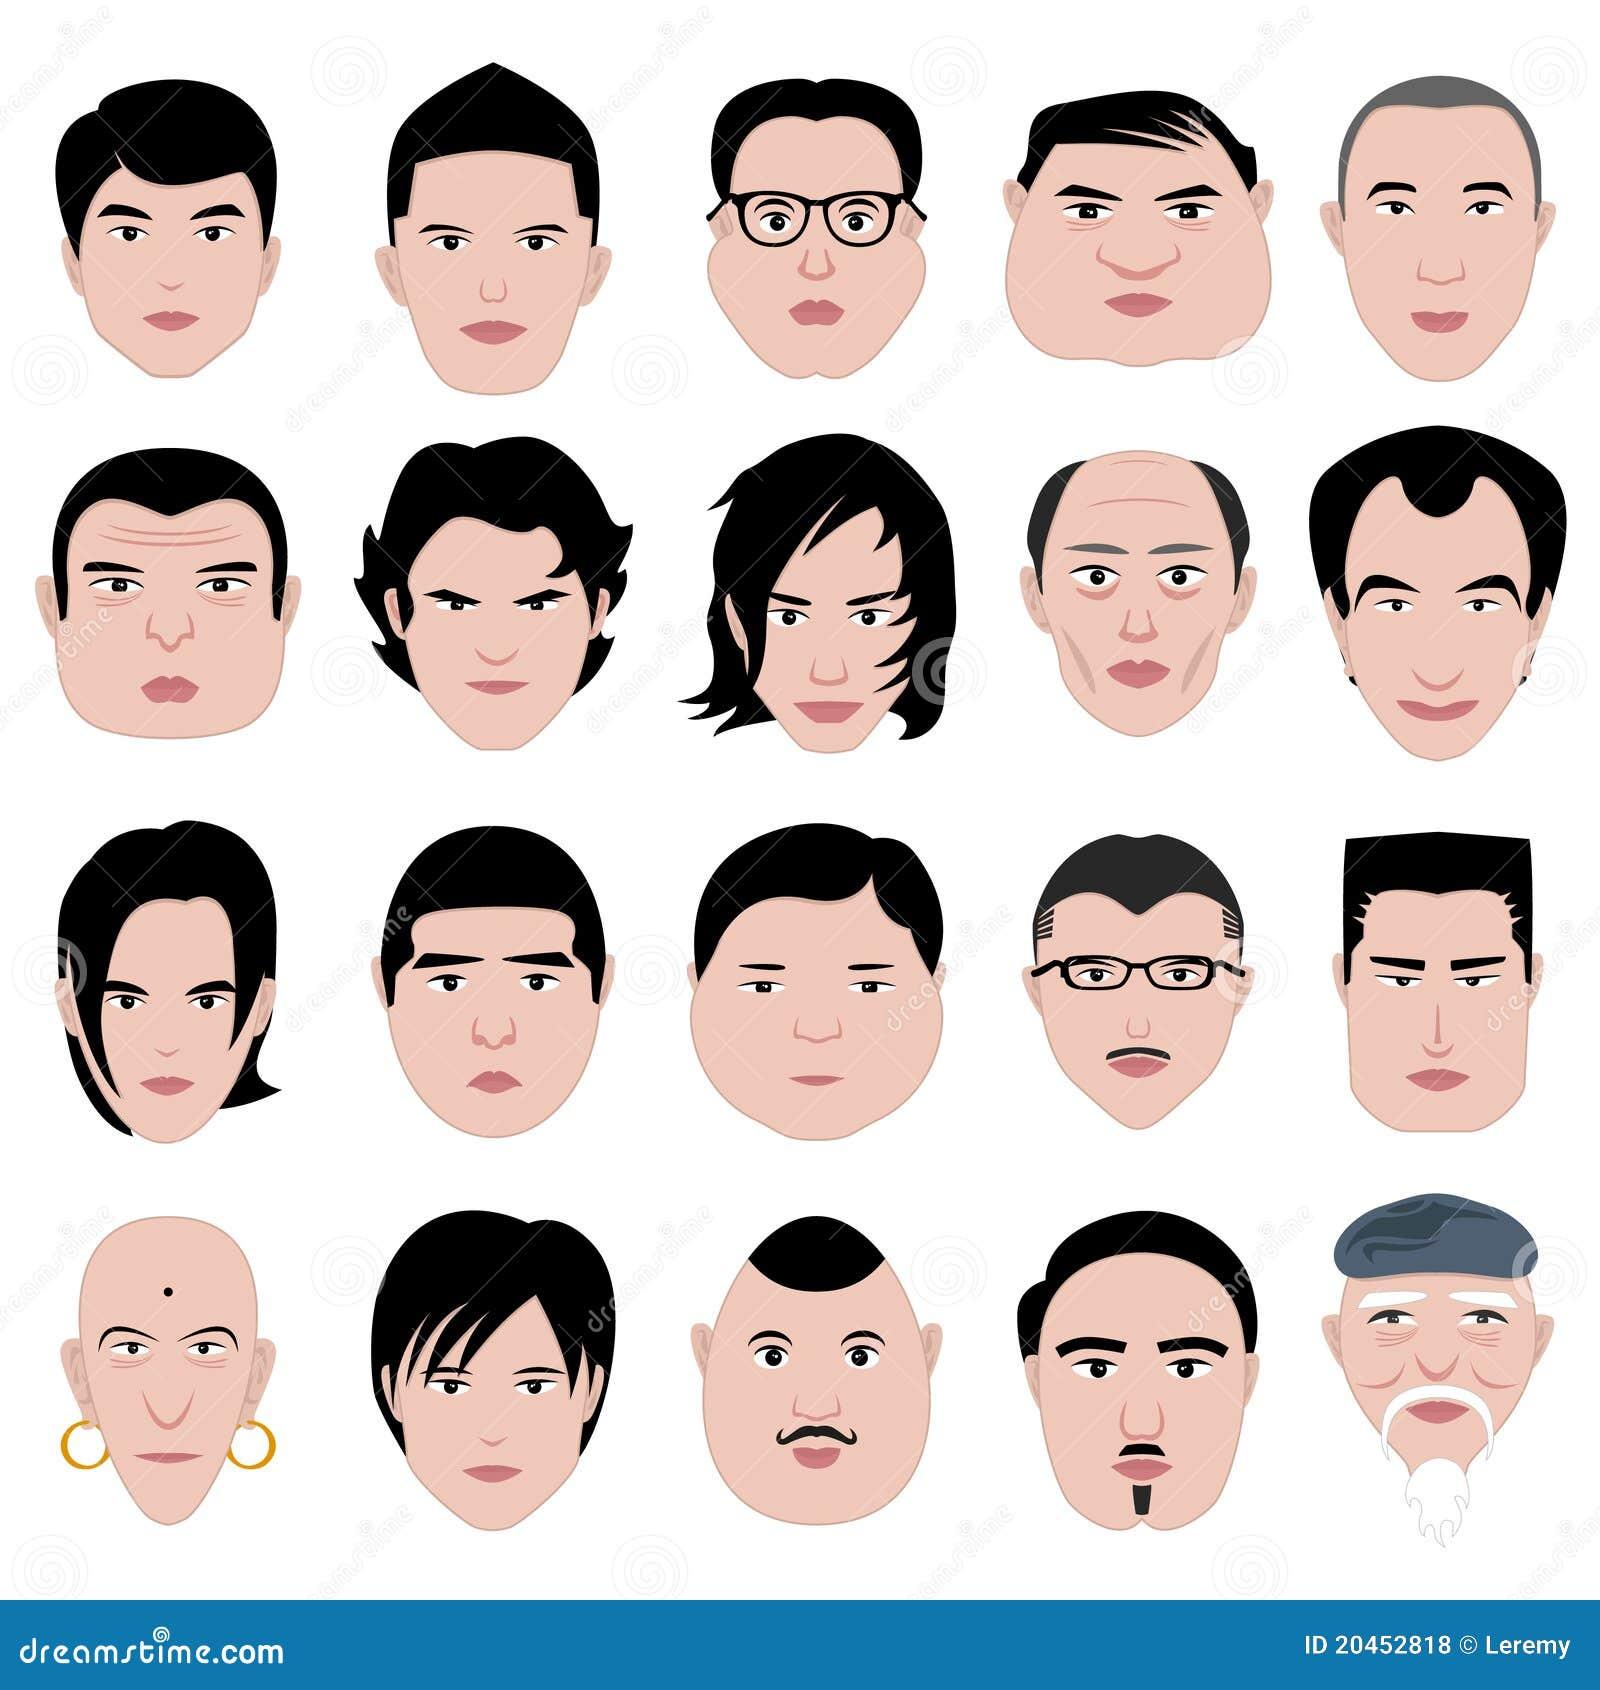 Miraculous Hairstyles For Men According To Face Shape Cheap Heleenvanoord Com Short Hairstyles Gunalazisus